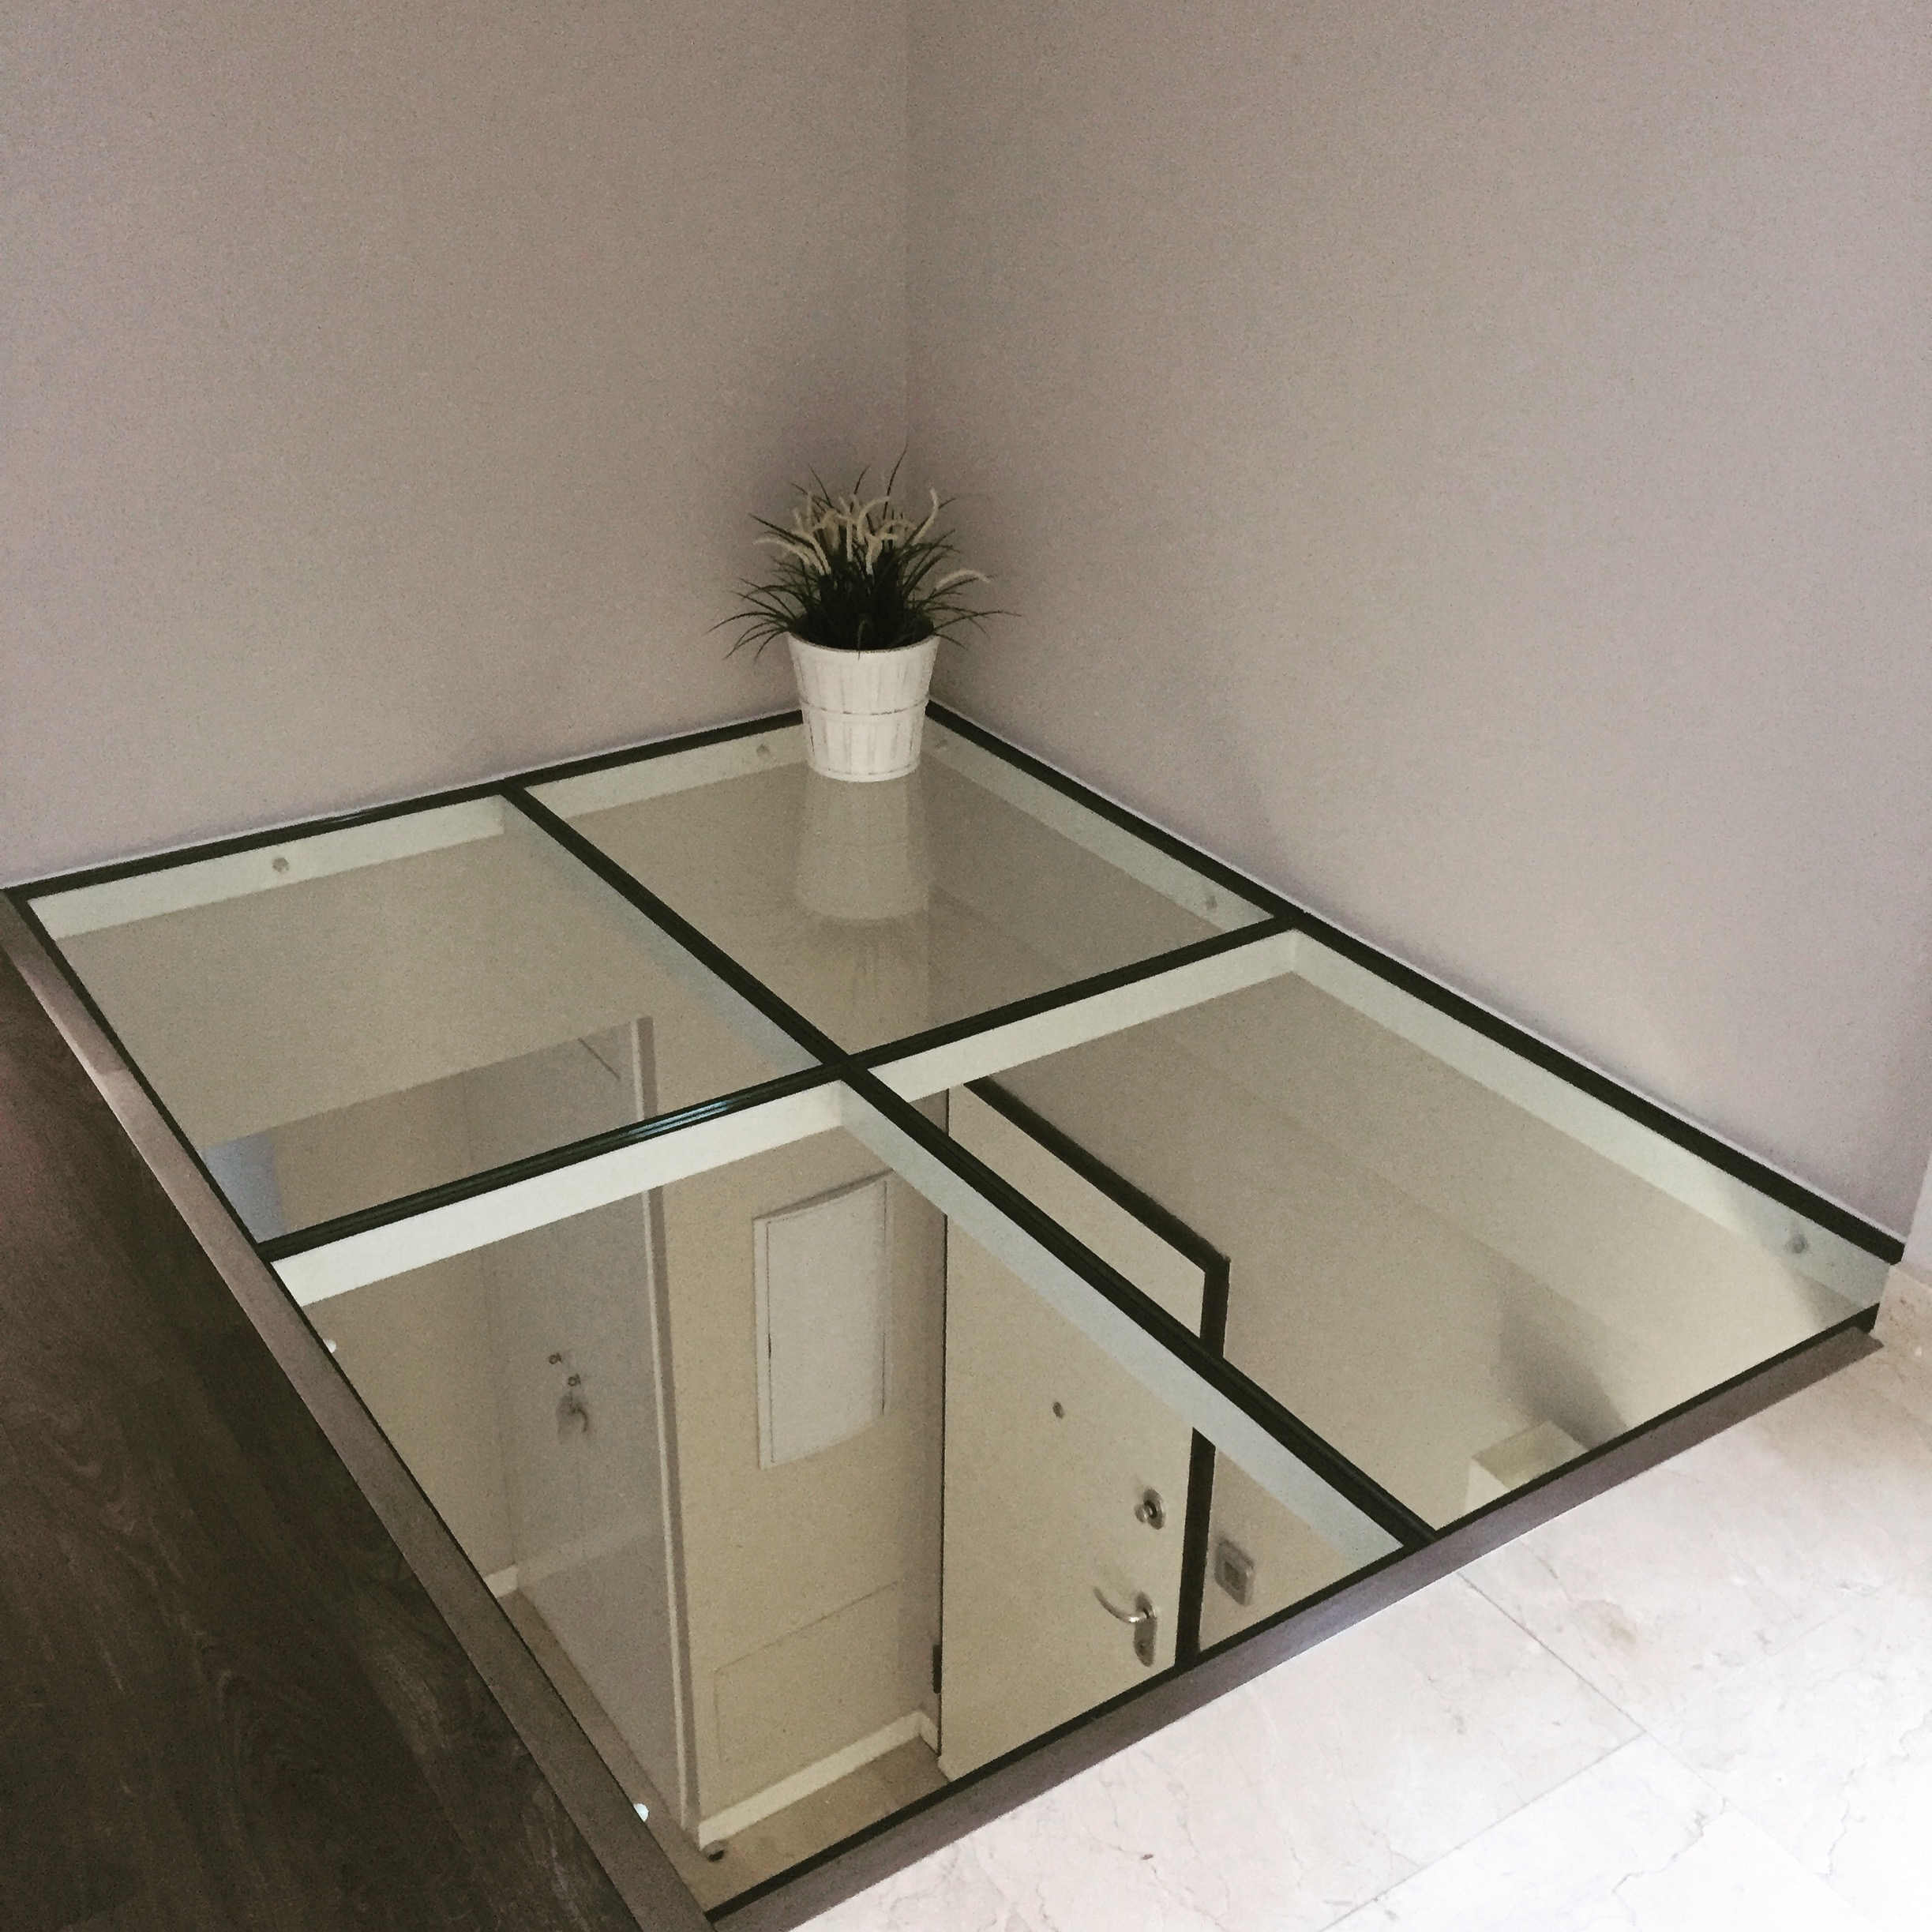 Vidrio design madrid todo en vidrio de dise o - Suelos de vidrio ...